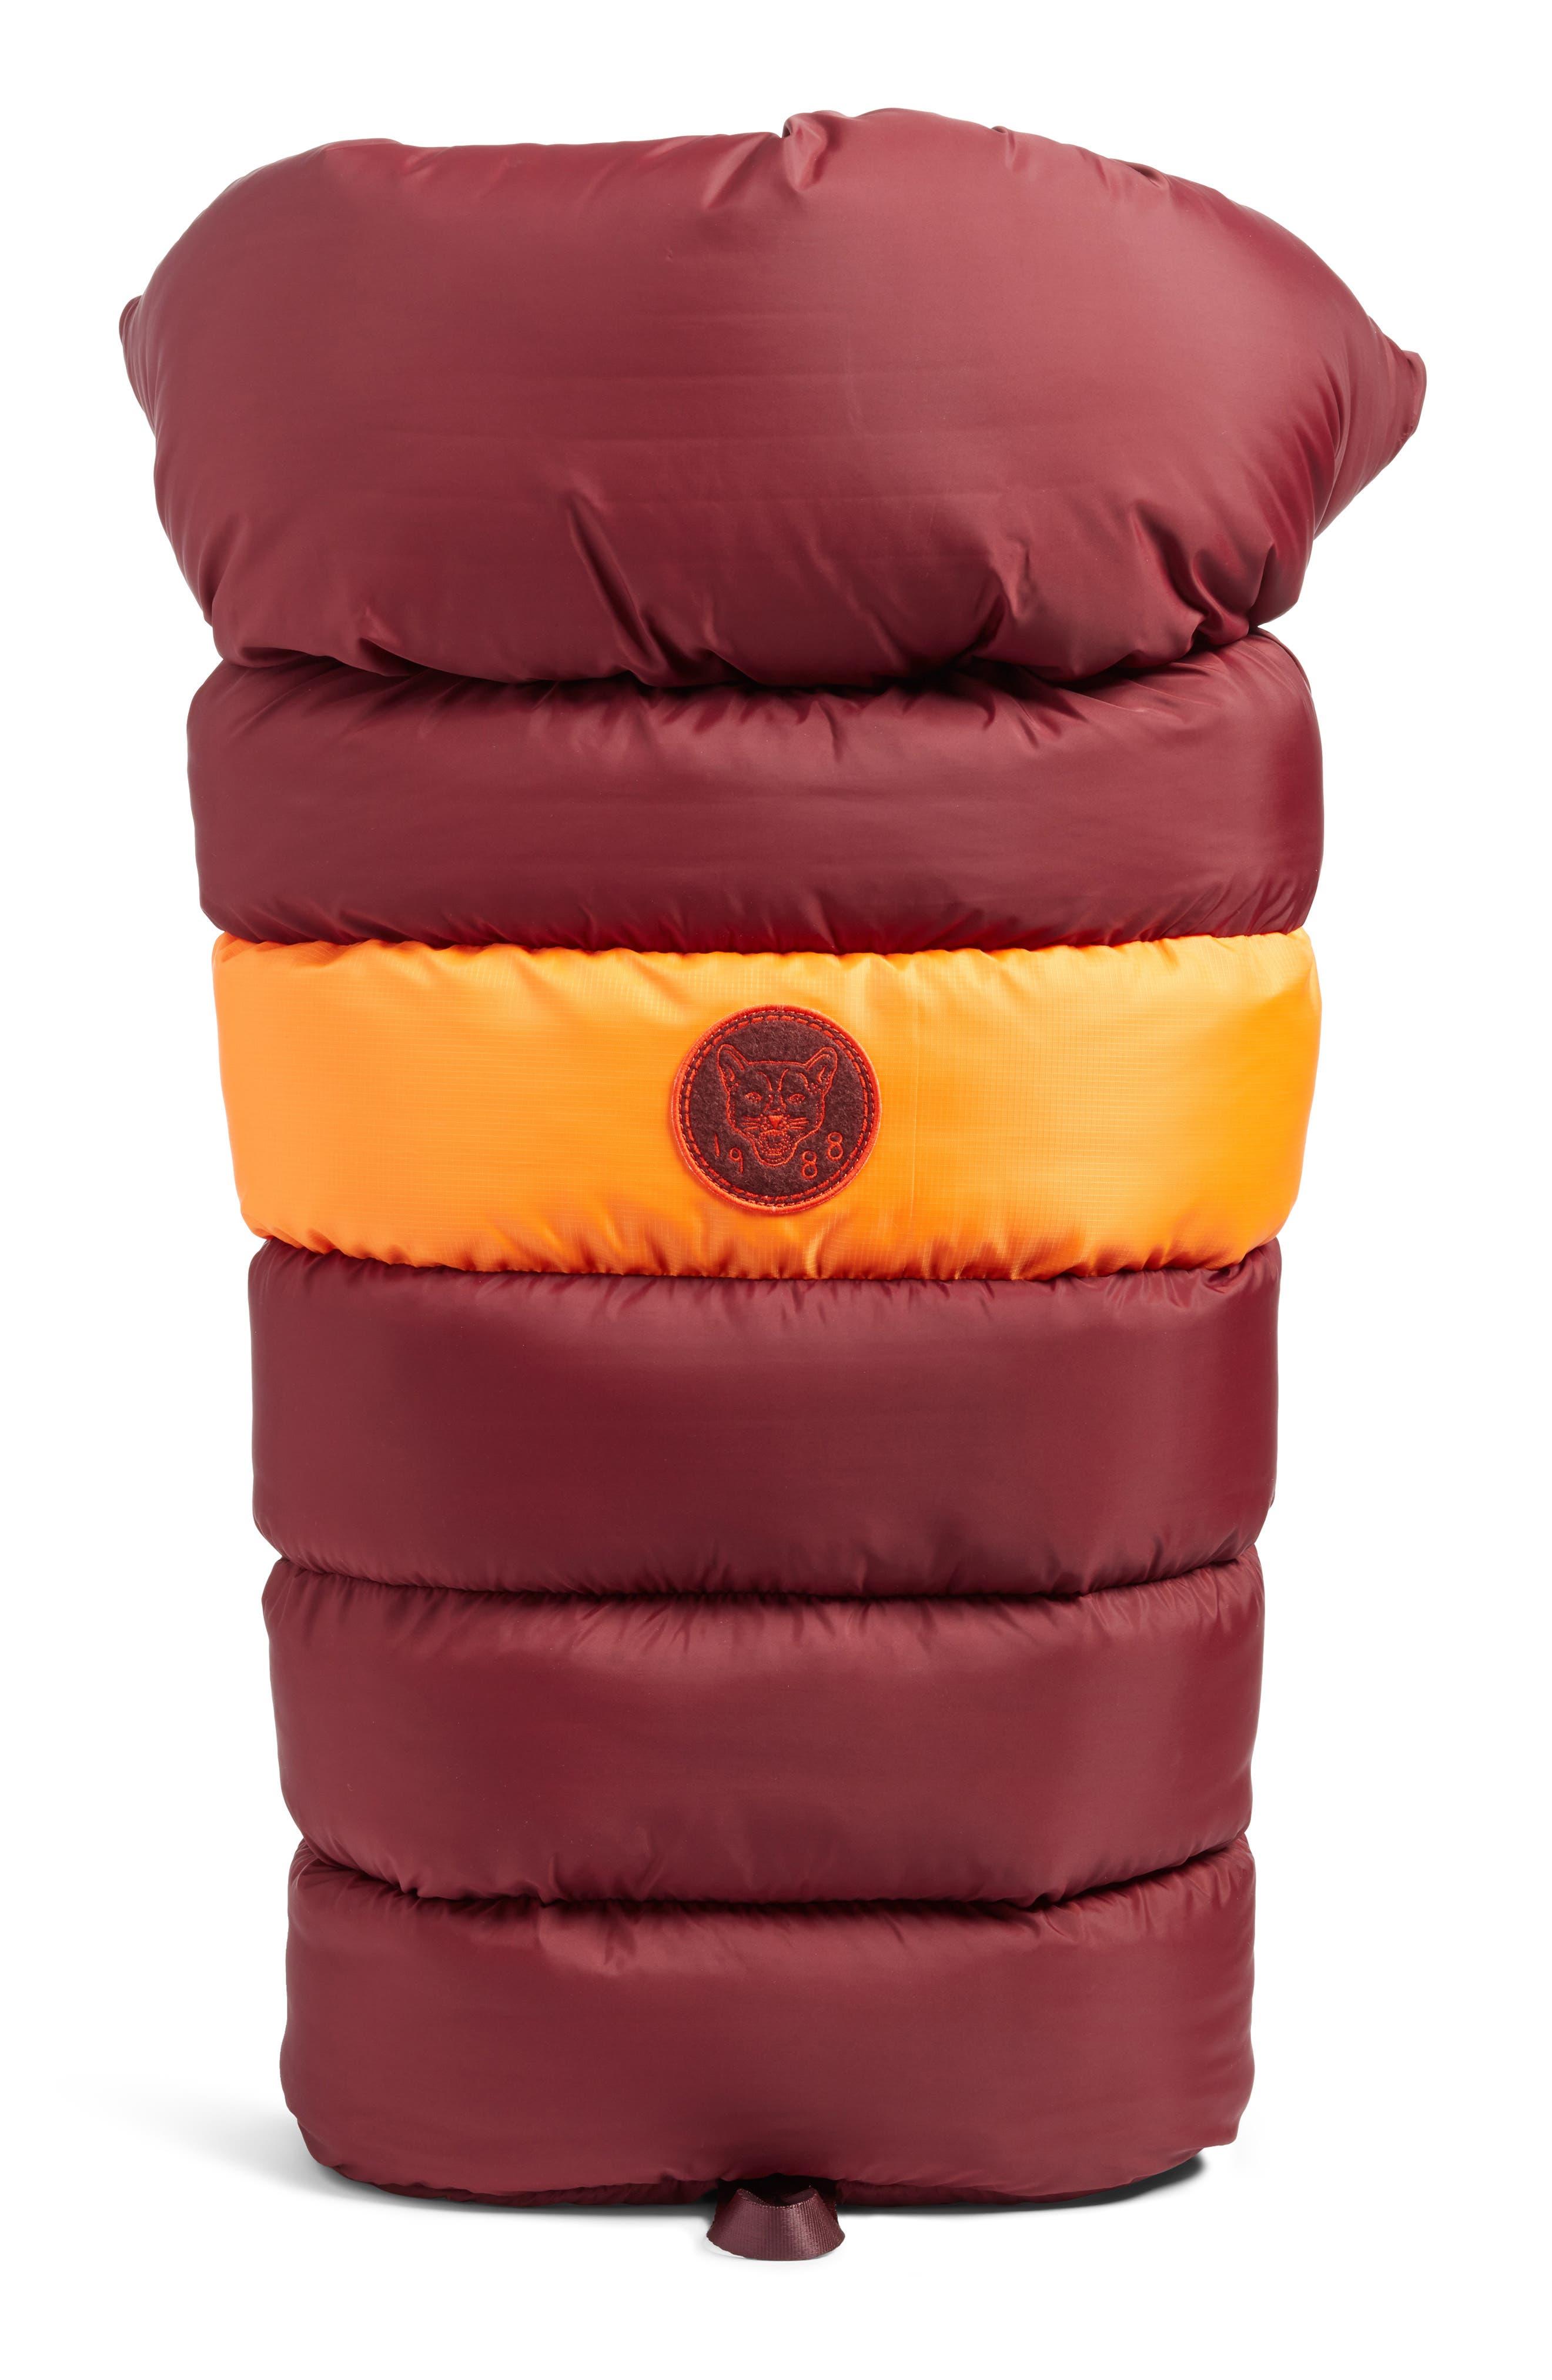 PUMA by Rihanna Backpack,                             Main thumbnail 1, color,                             Burgundy Orange